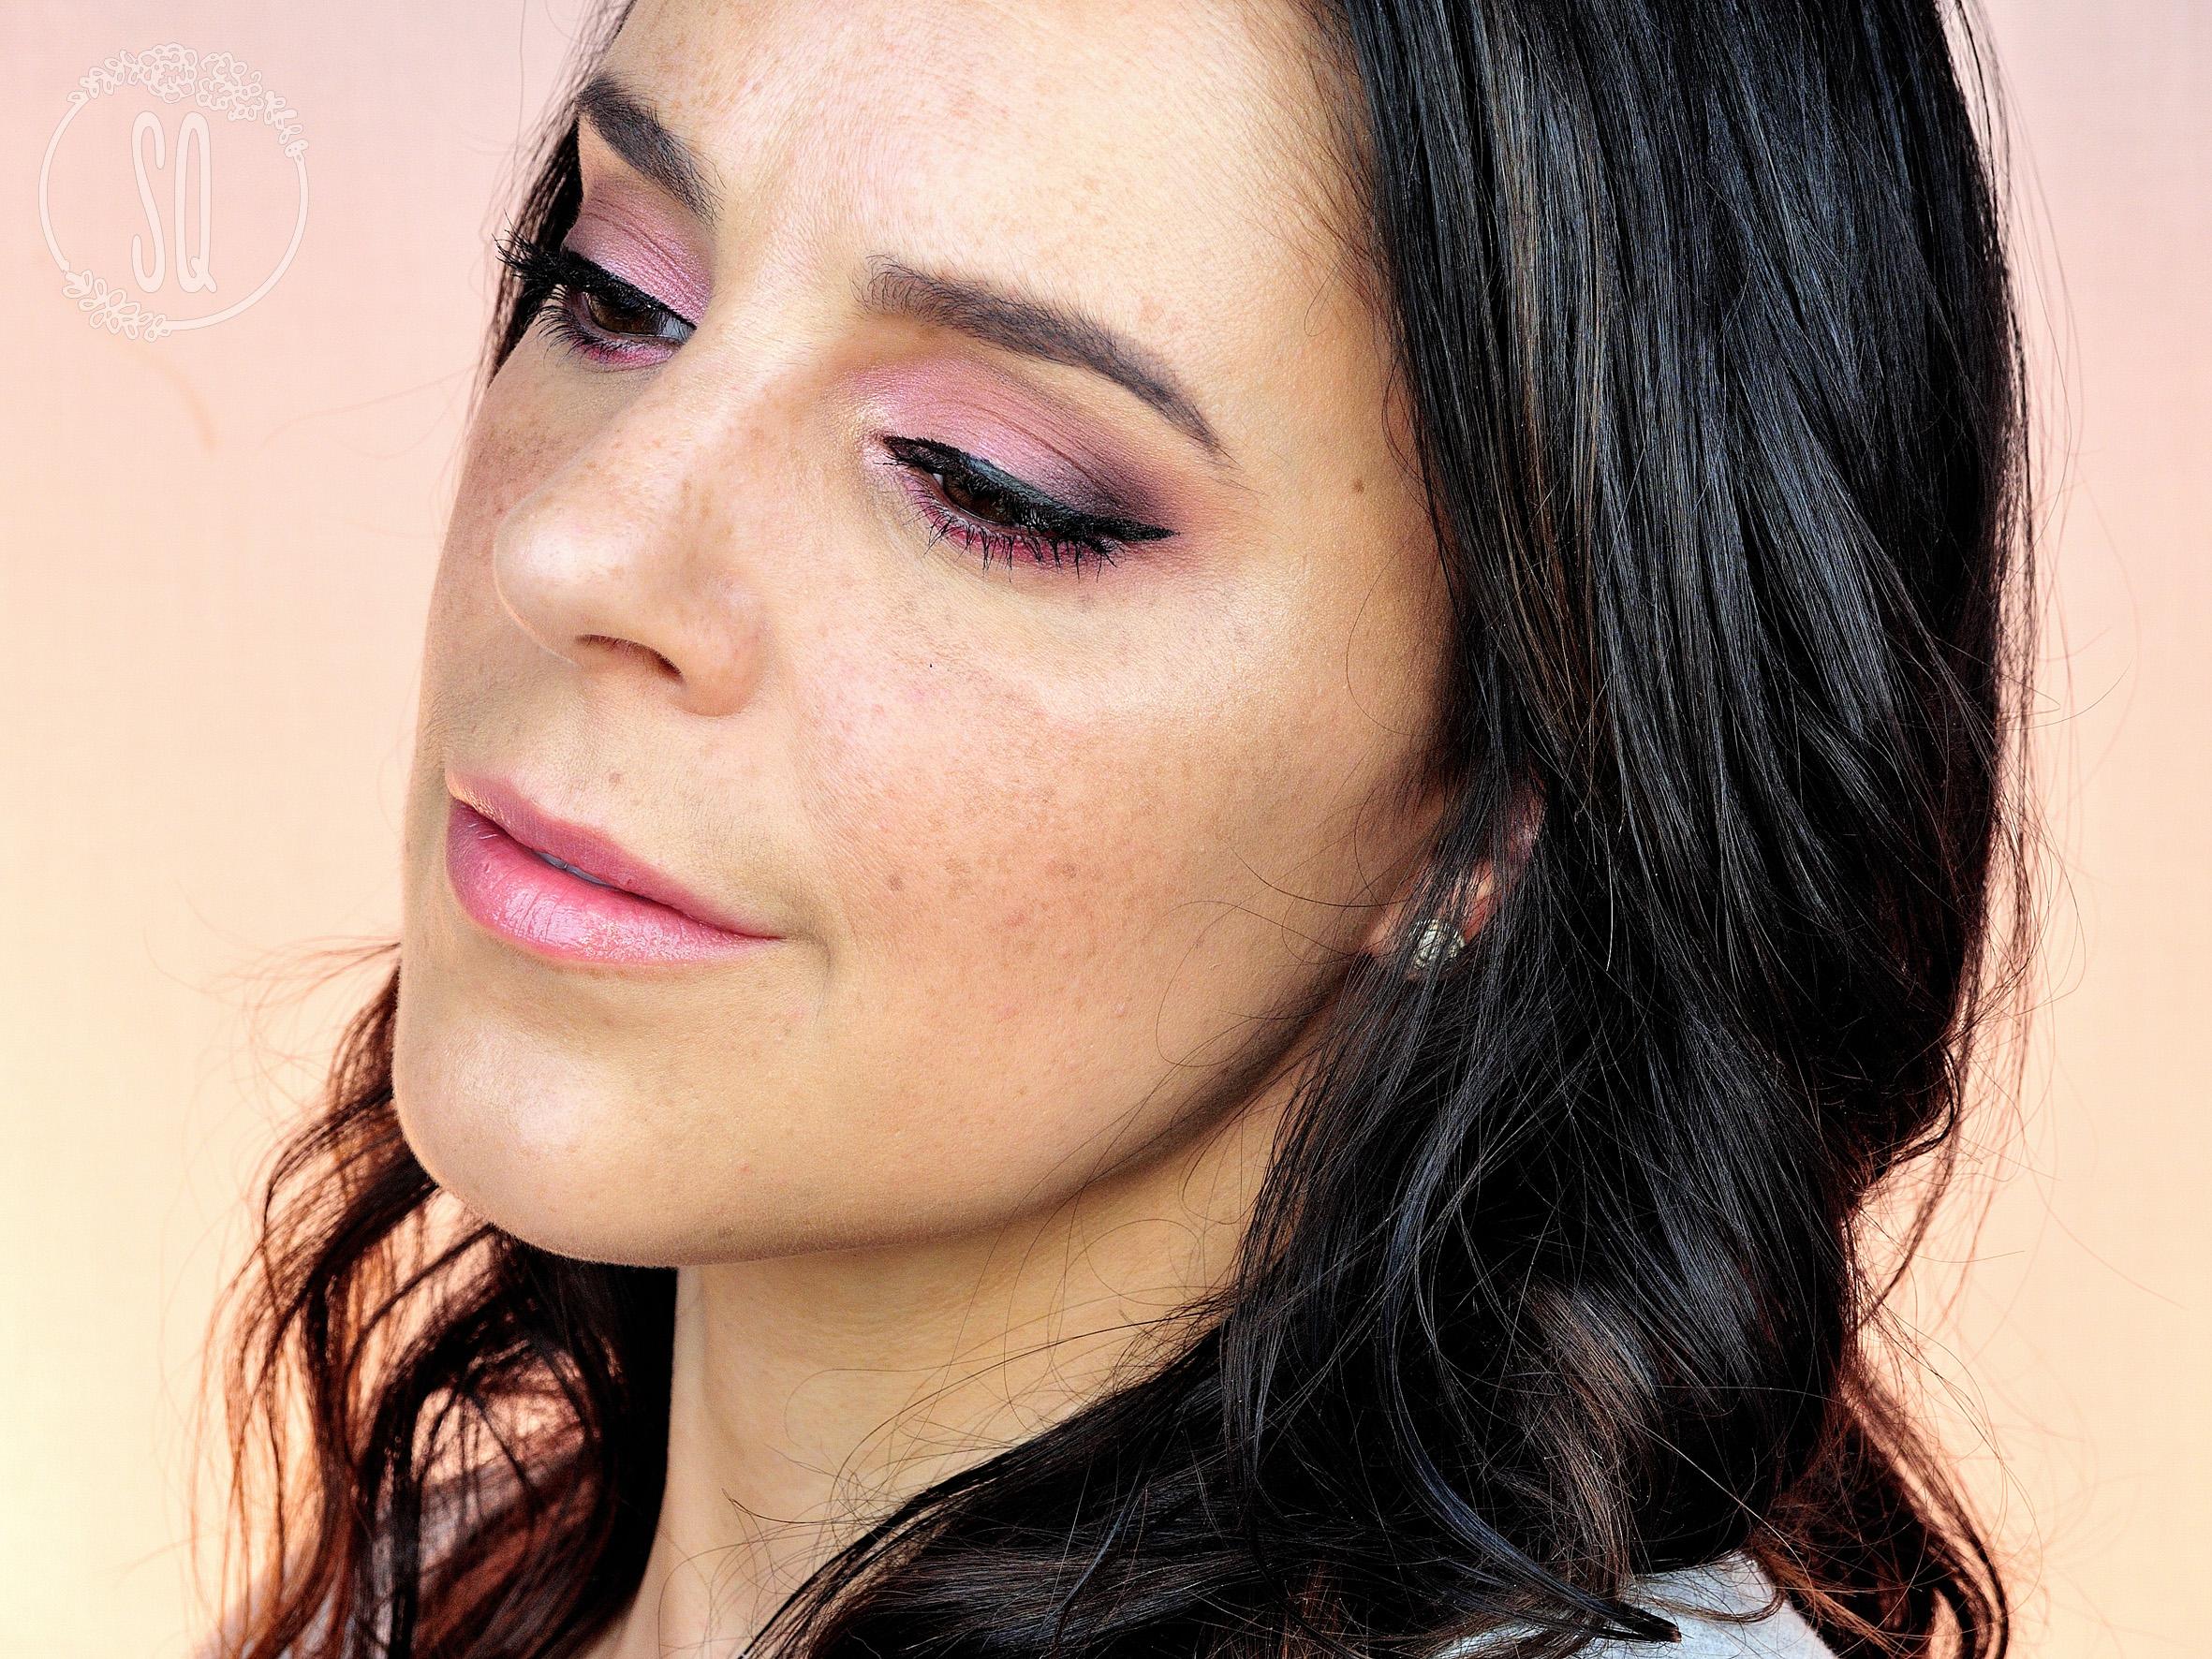 Maquillaje rosa y eyeliner, dulce y sexy